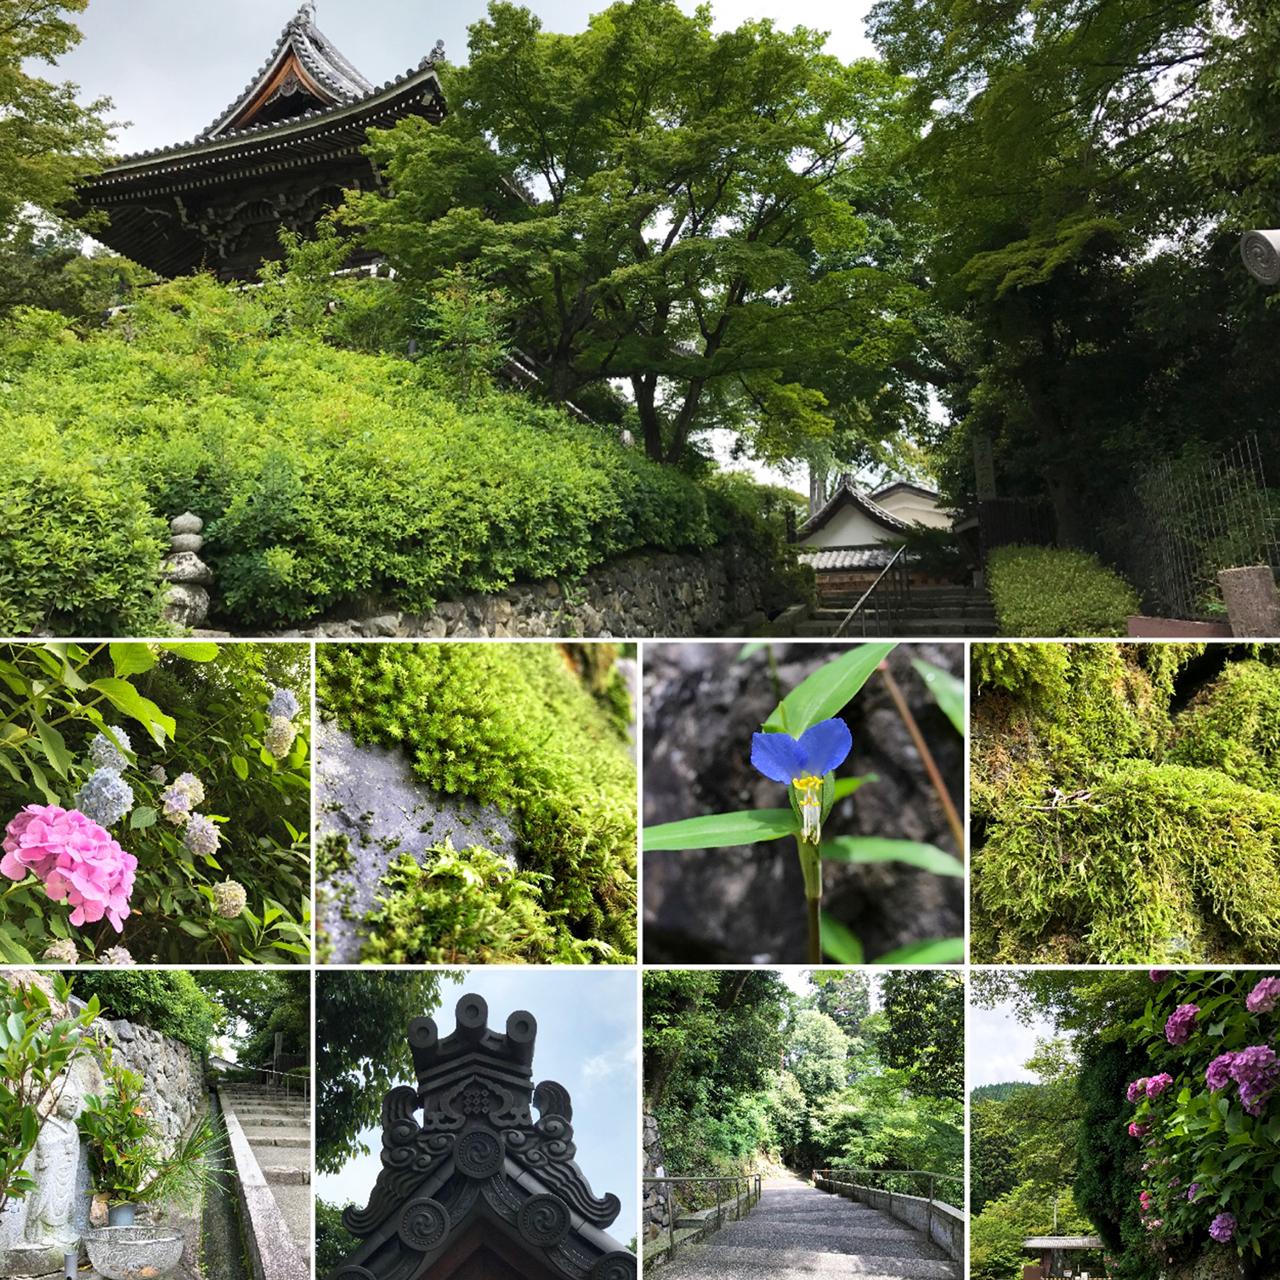 善峯寺-駐車場付近の風景